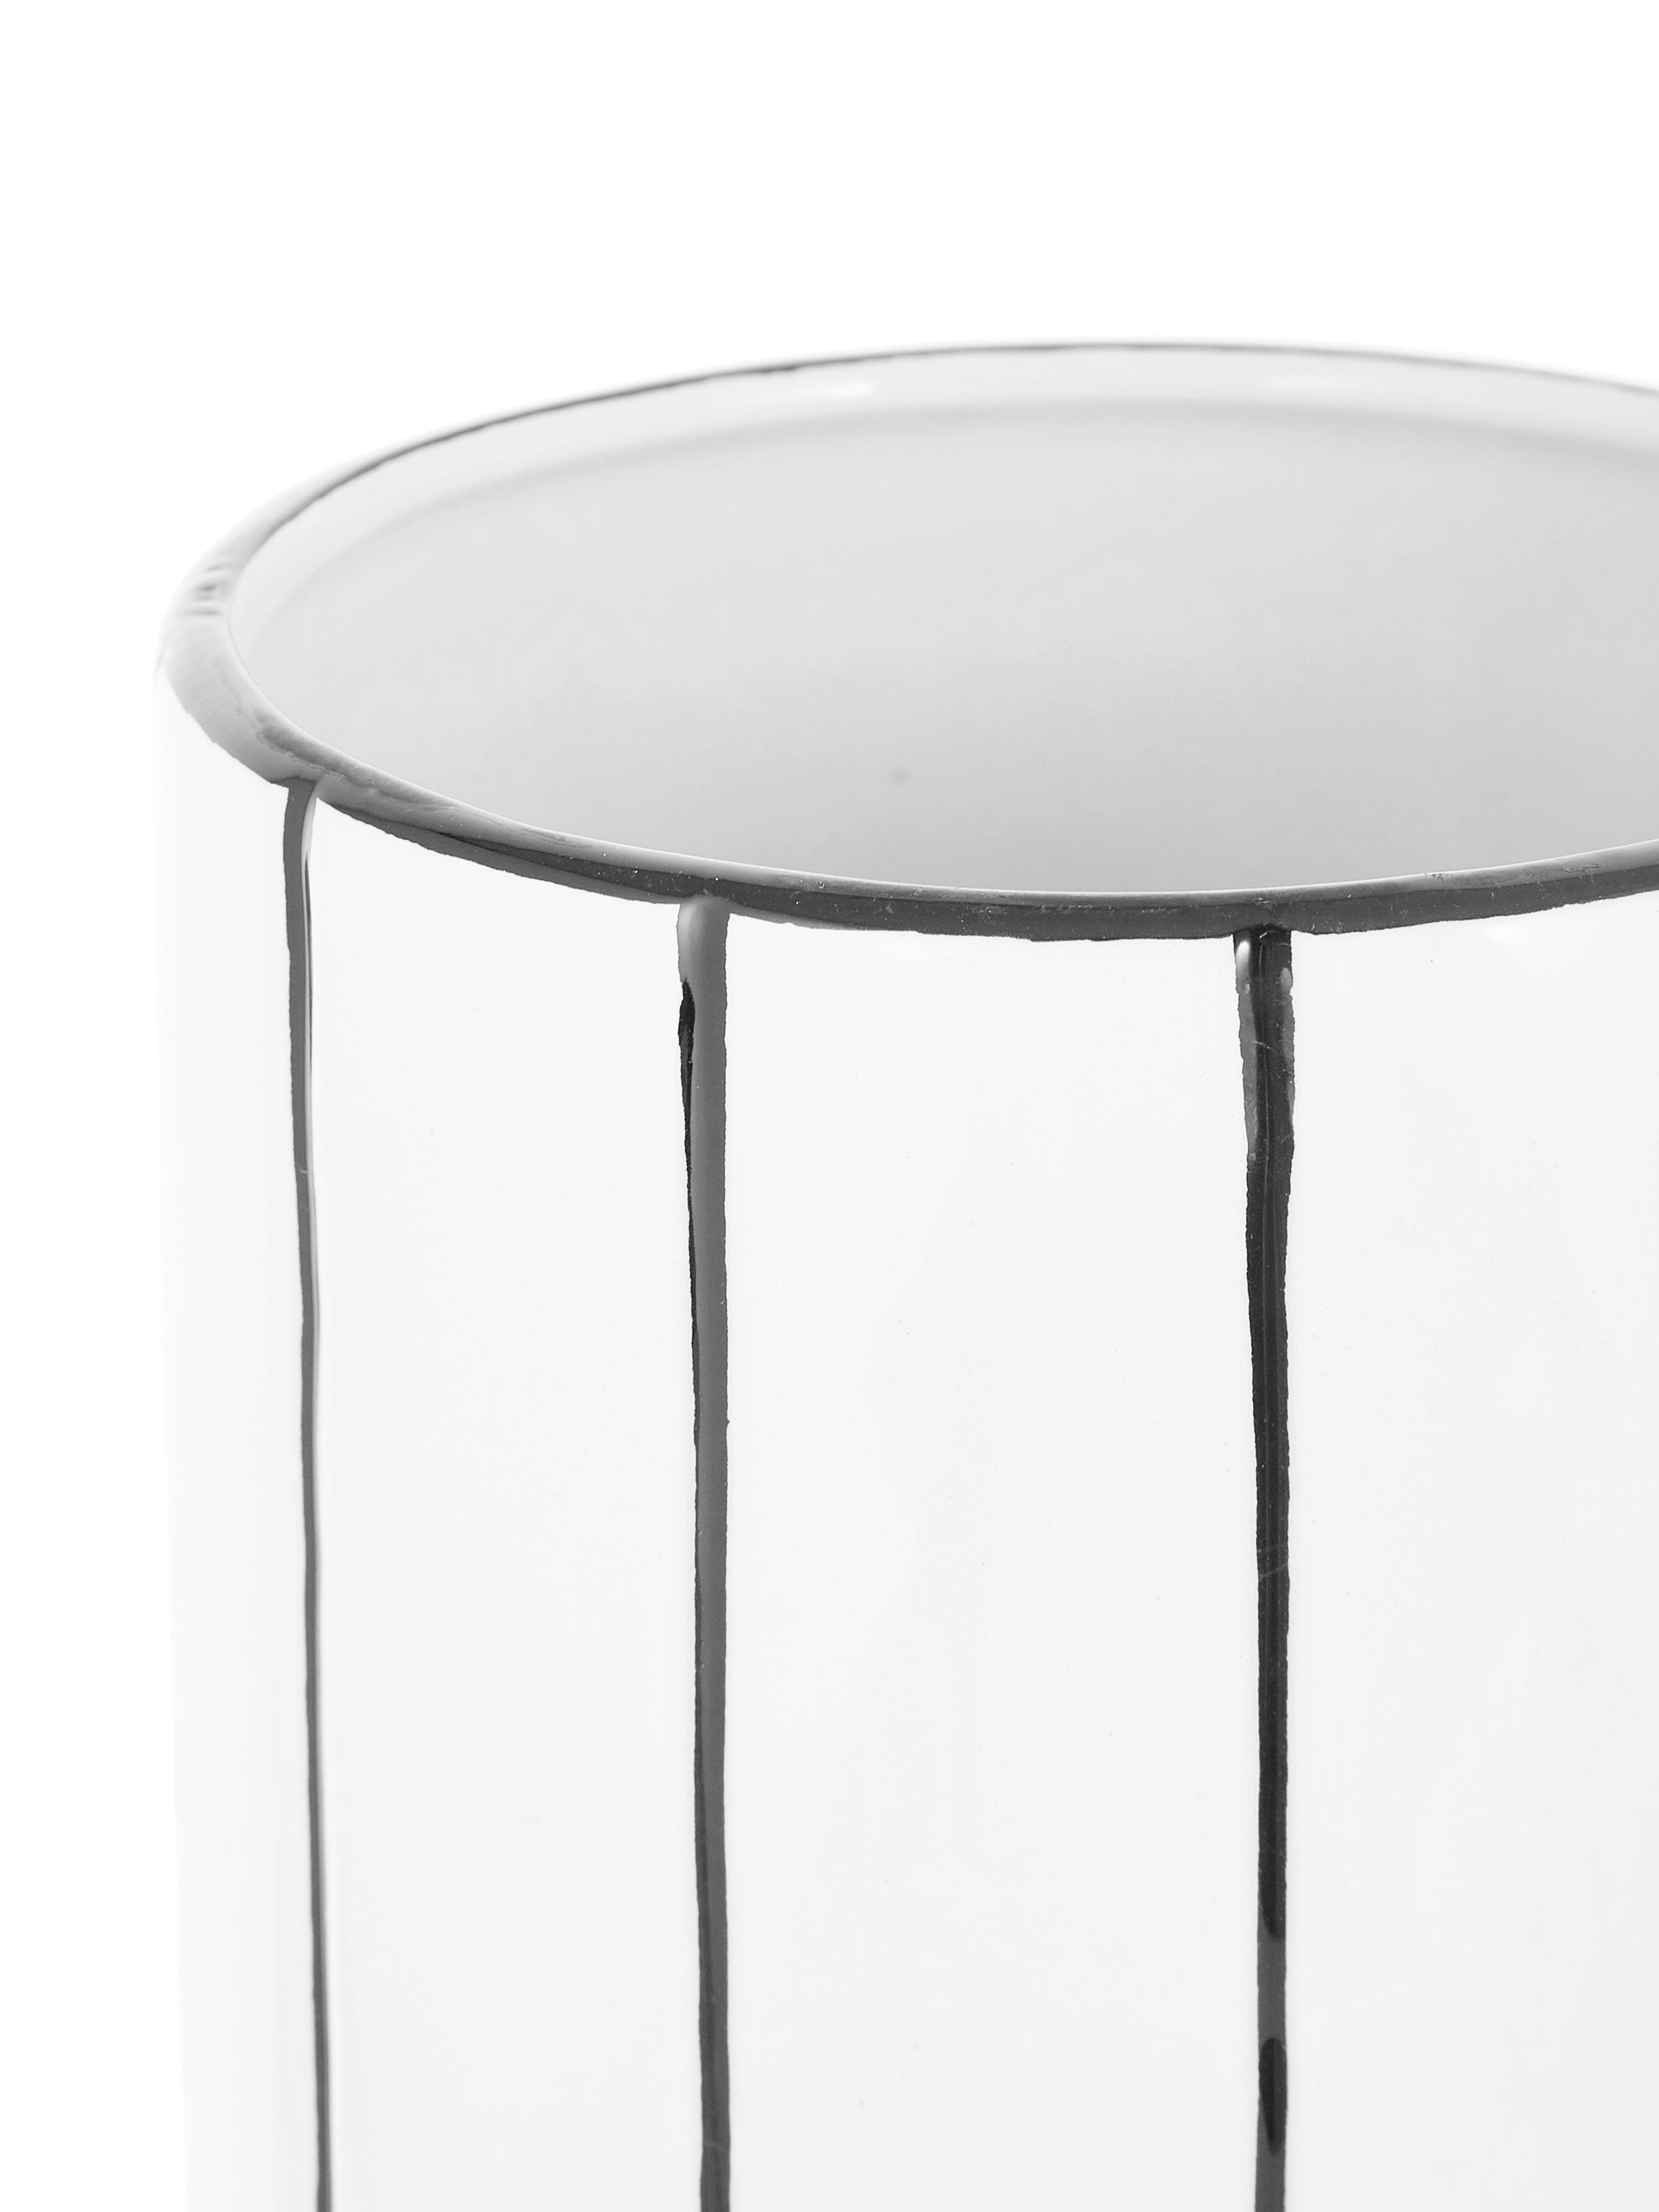 Portavaso Reno, Gres, Bianco, nero, Ø 14 x Alt. 20 cm